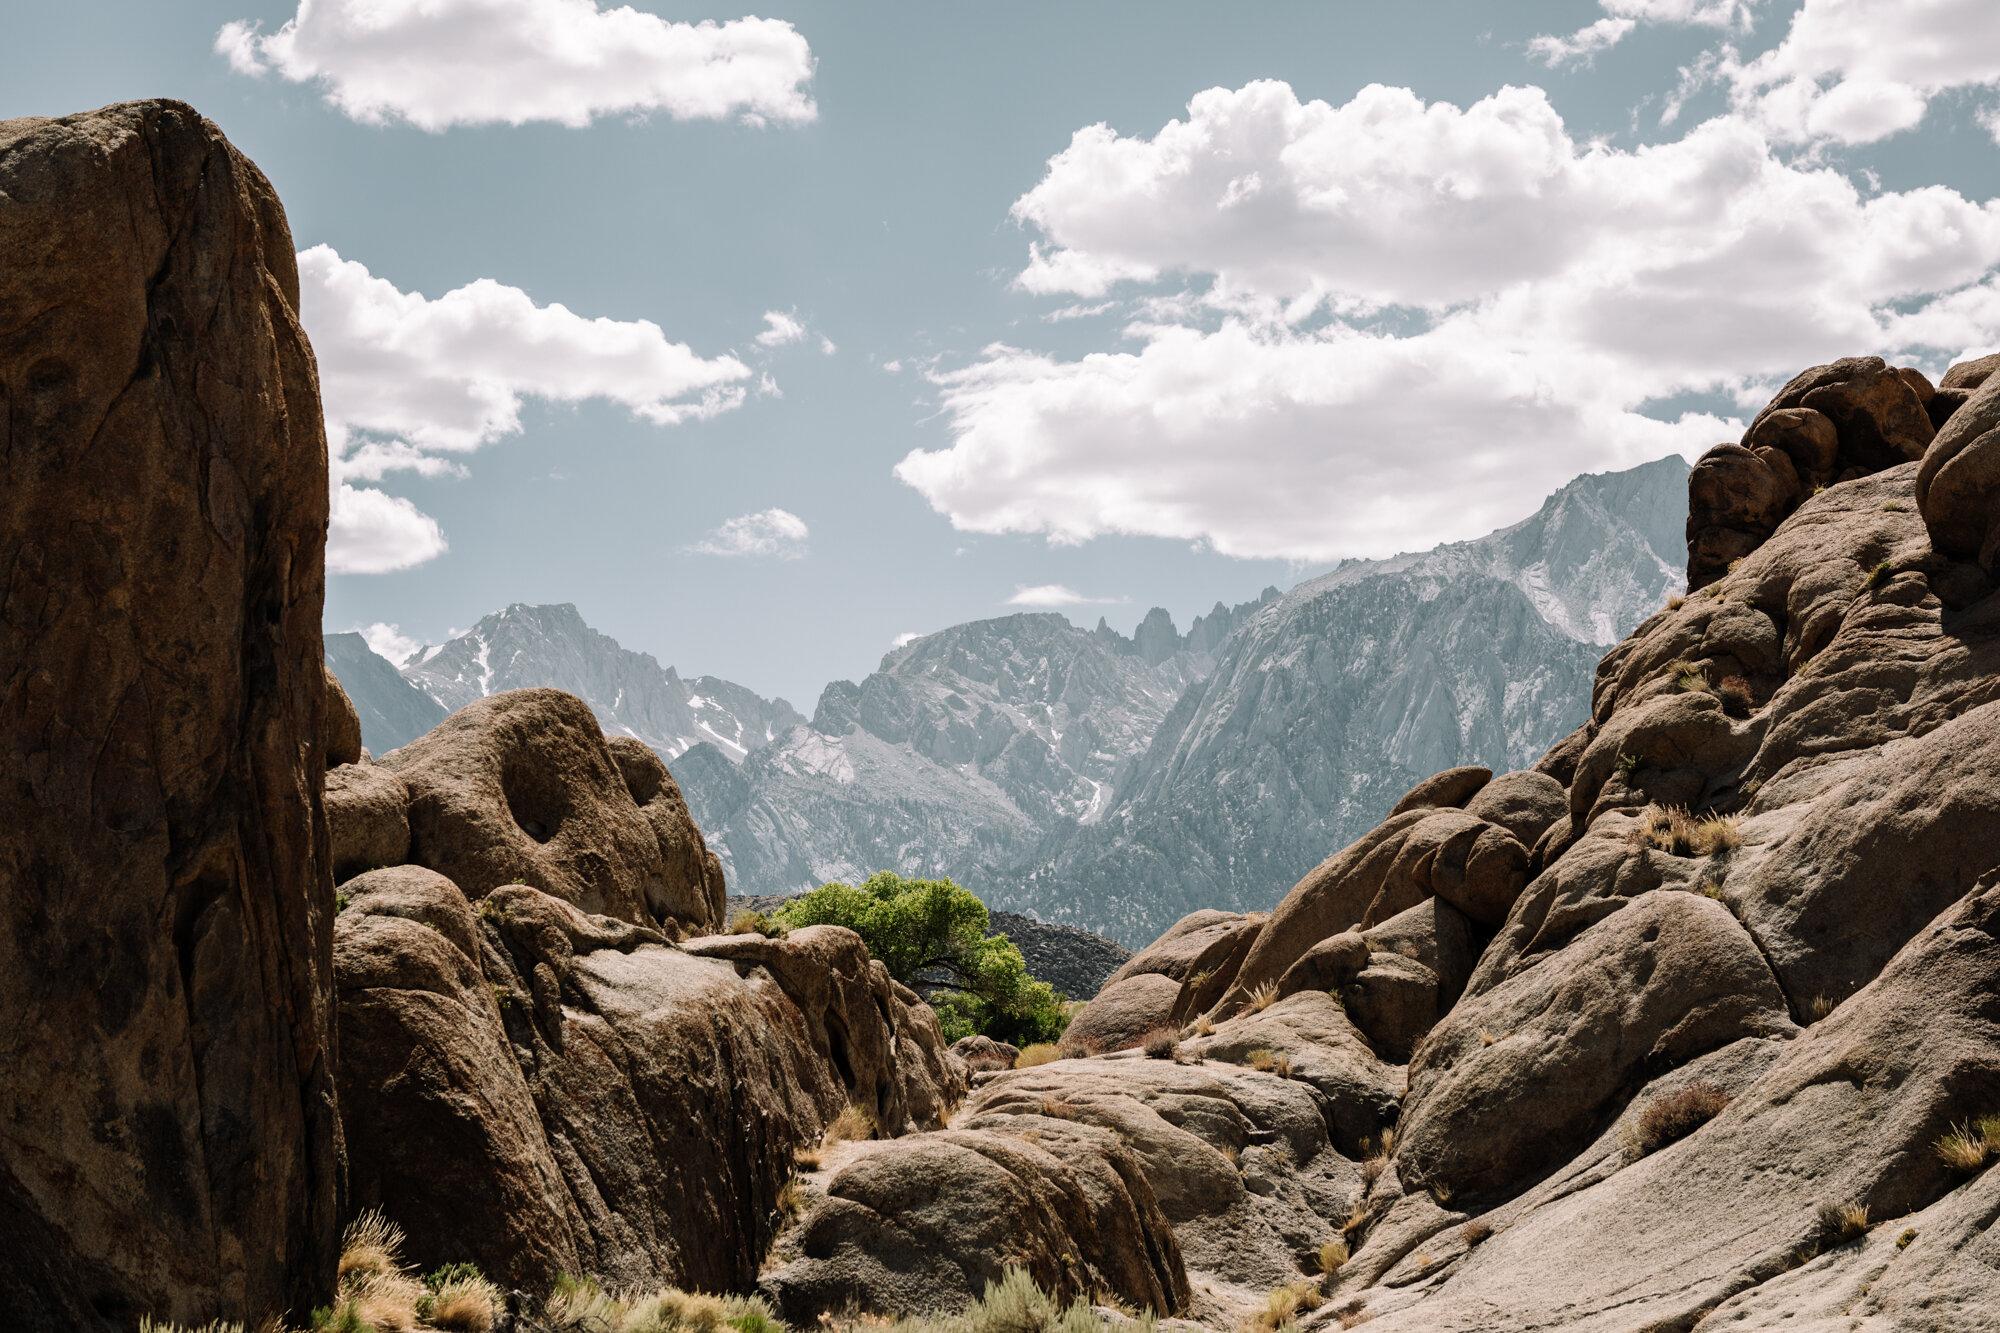 Rachel Off Duty: Alabama Hills and the Sierra Nevadas, California